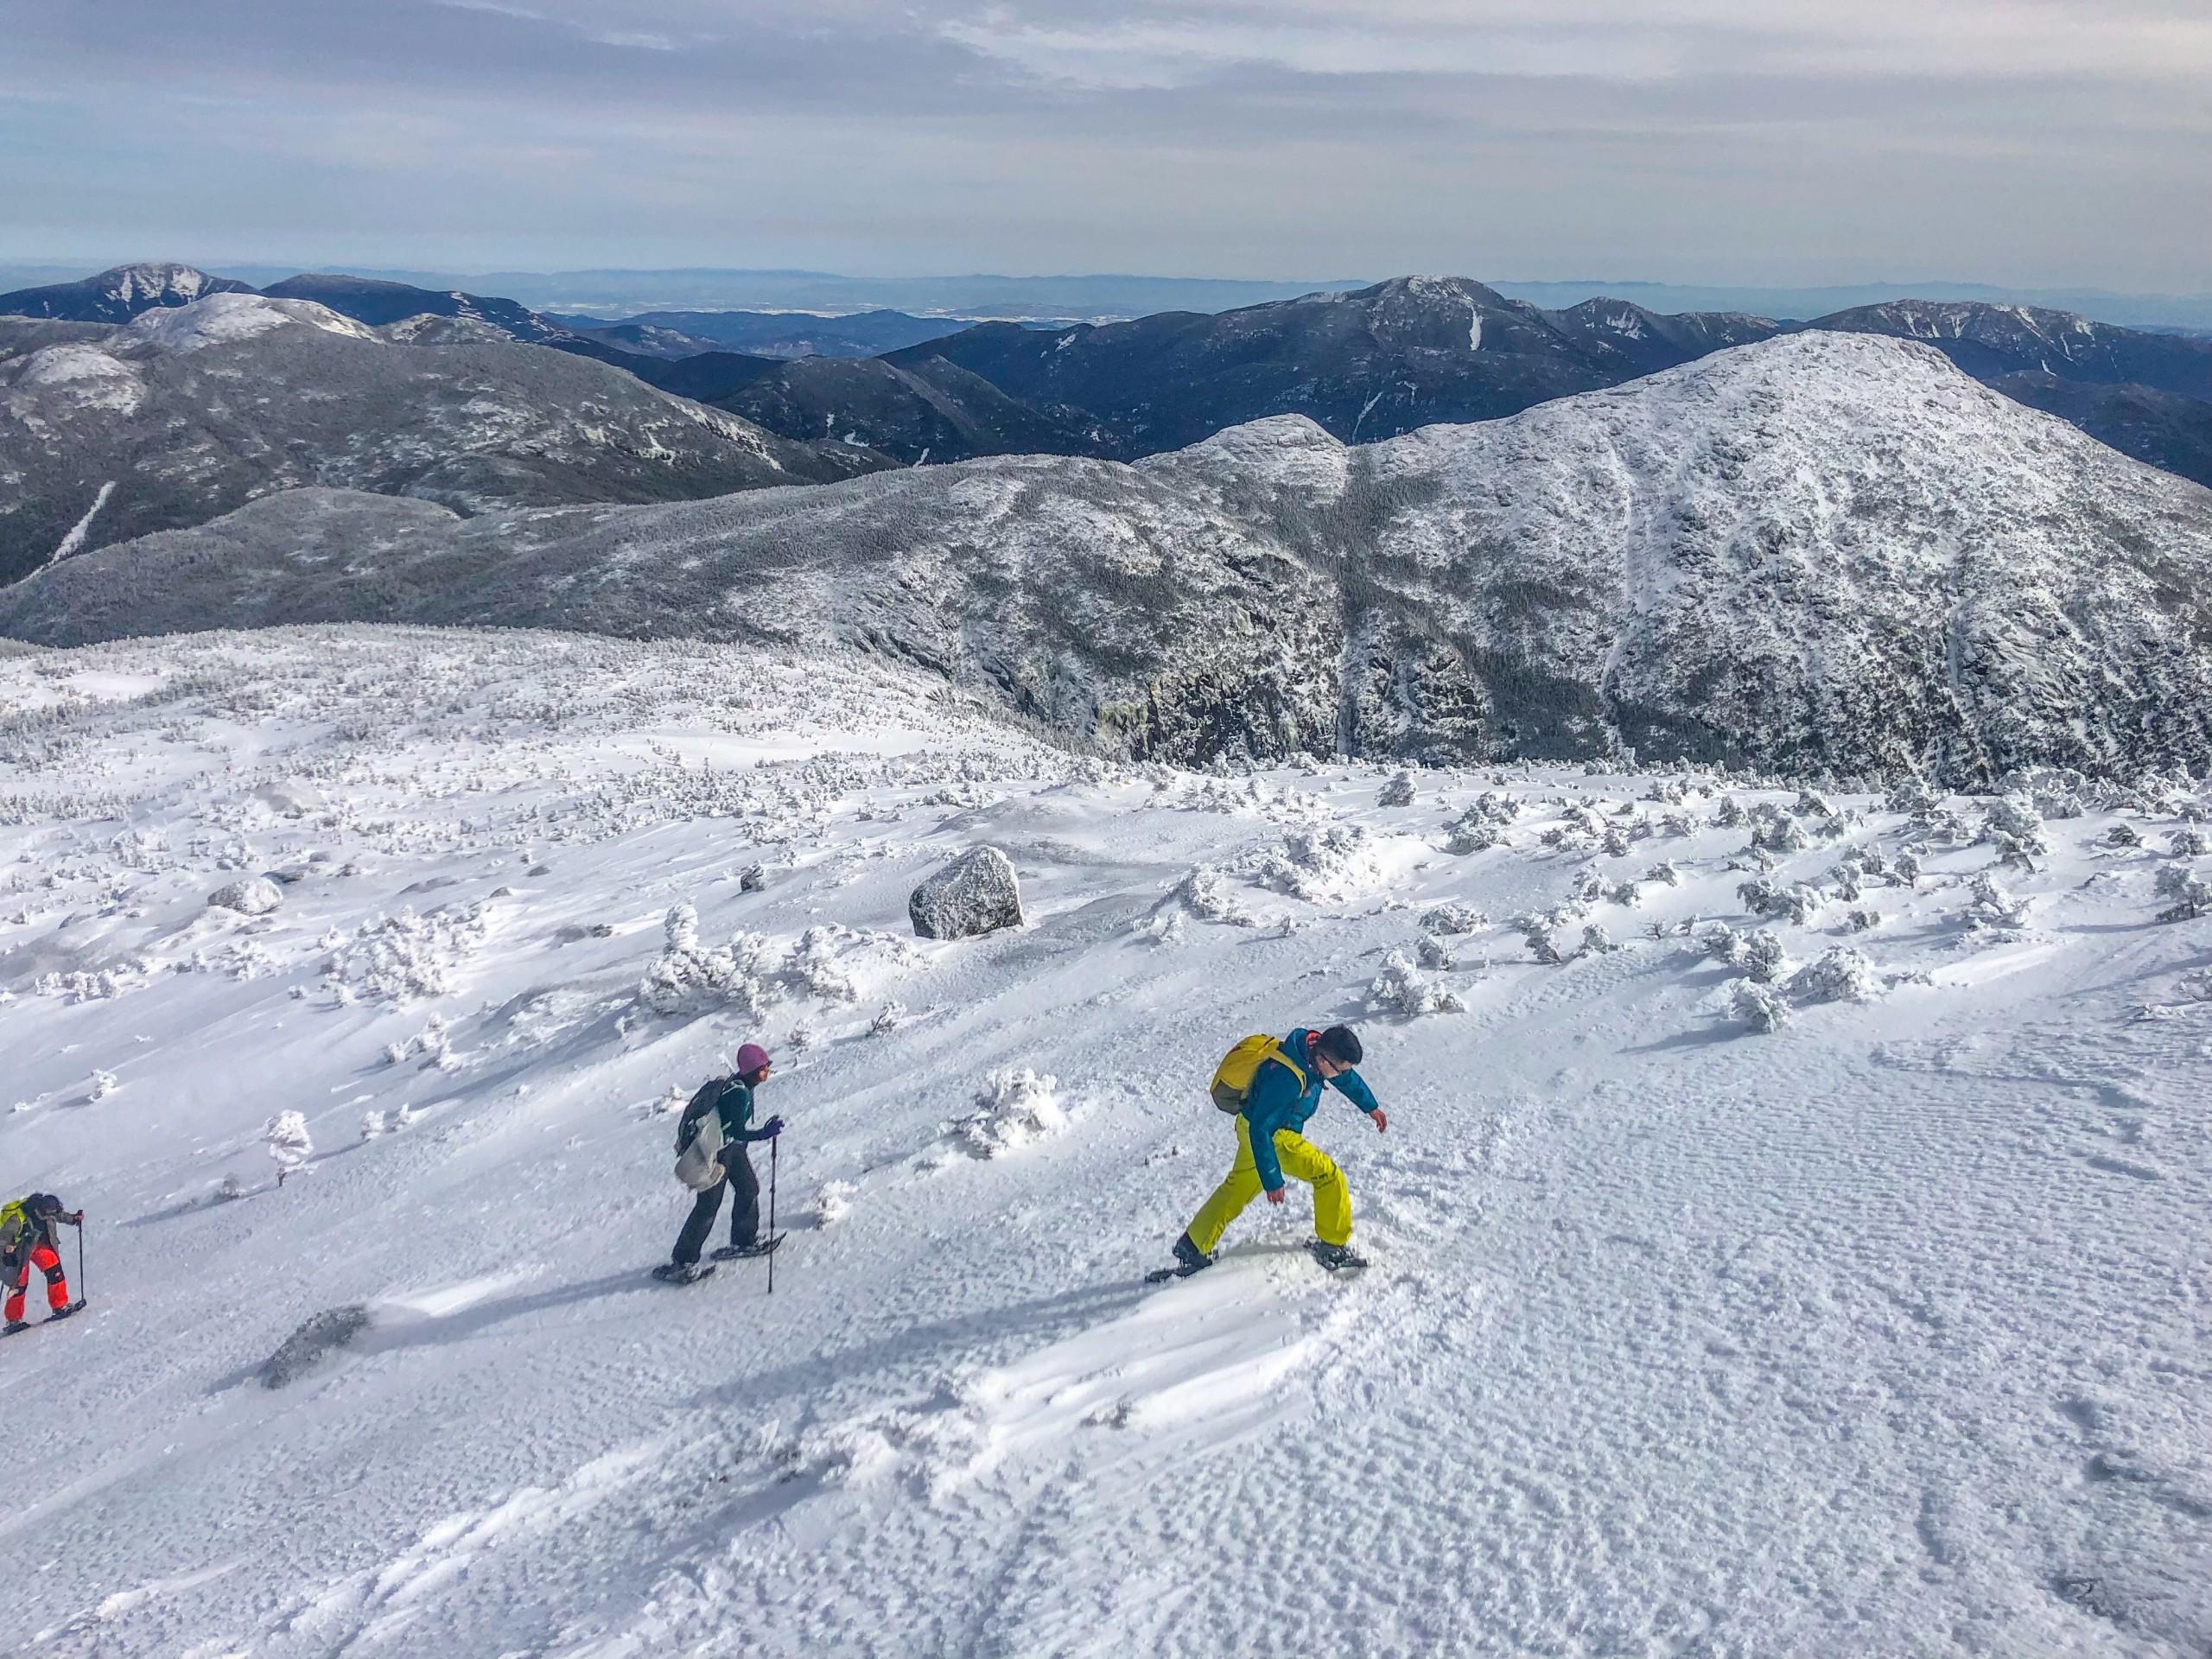 Three people walking on a snowy mountain ridgeline